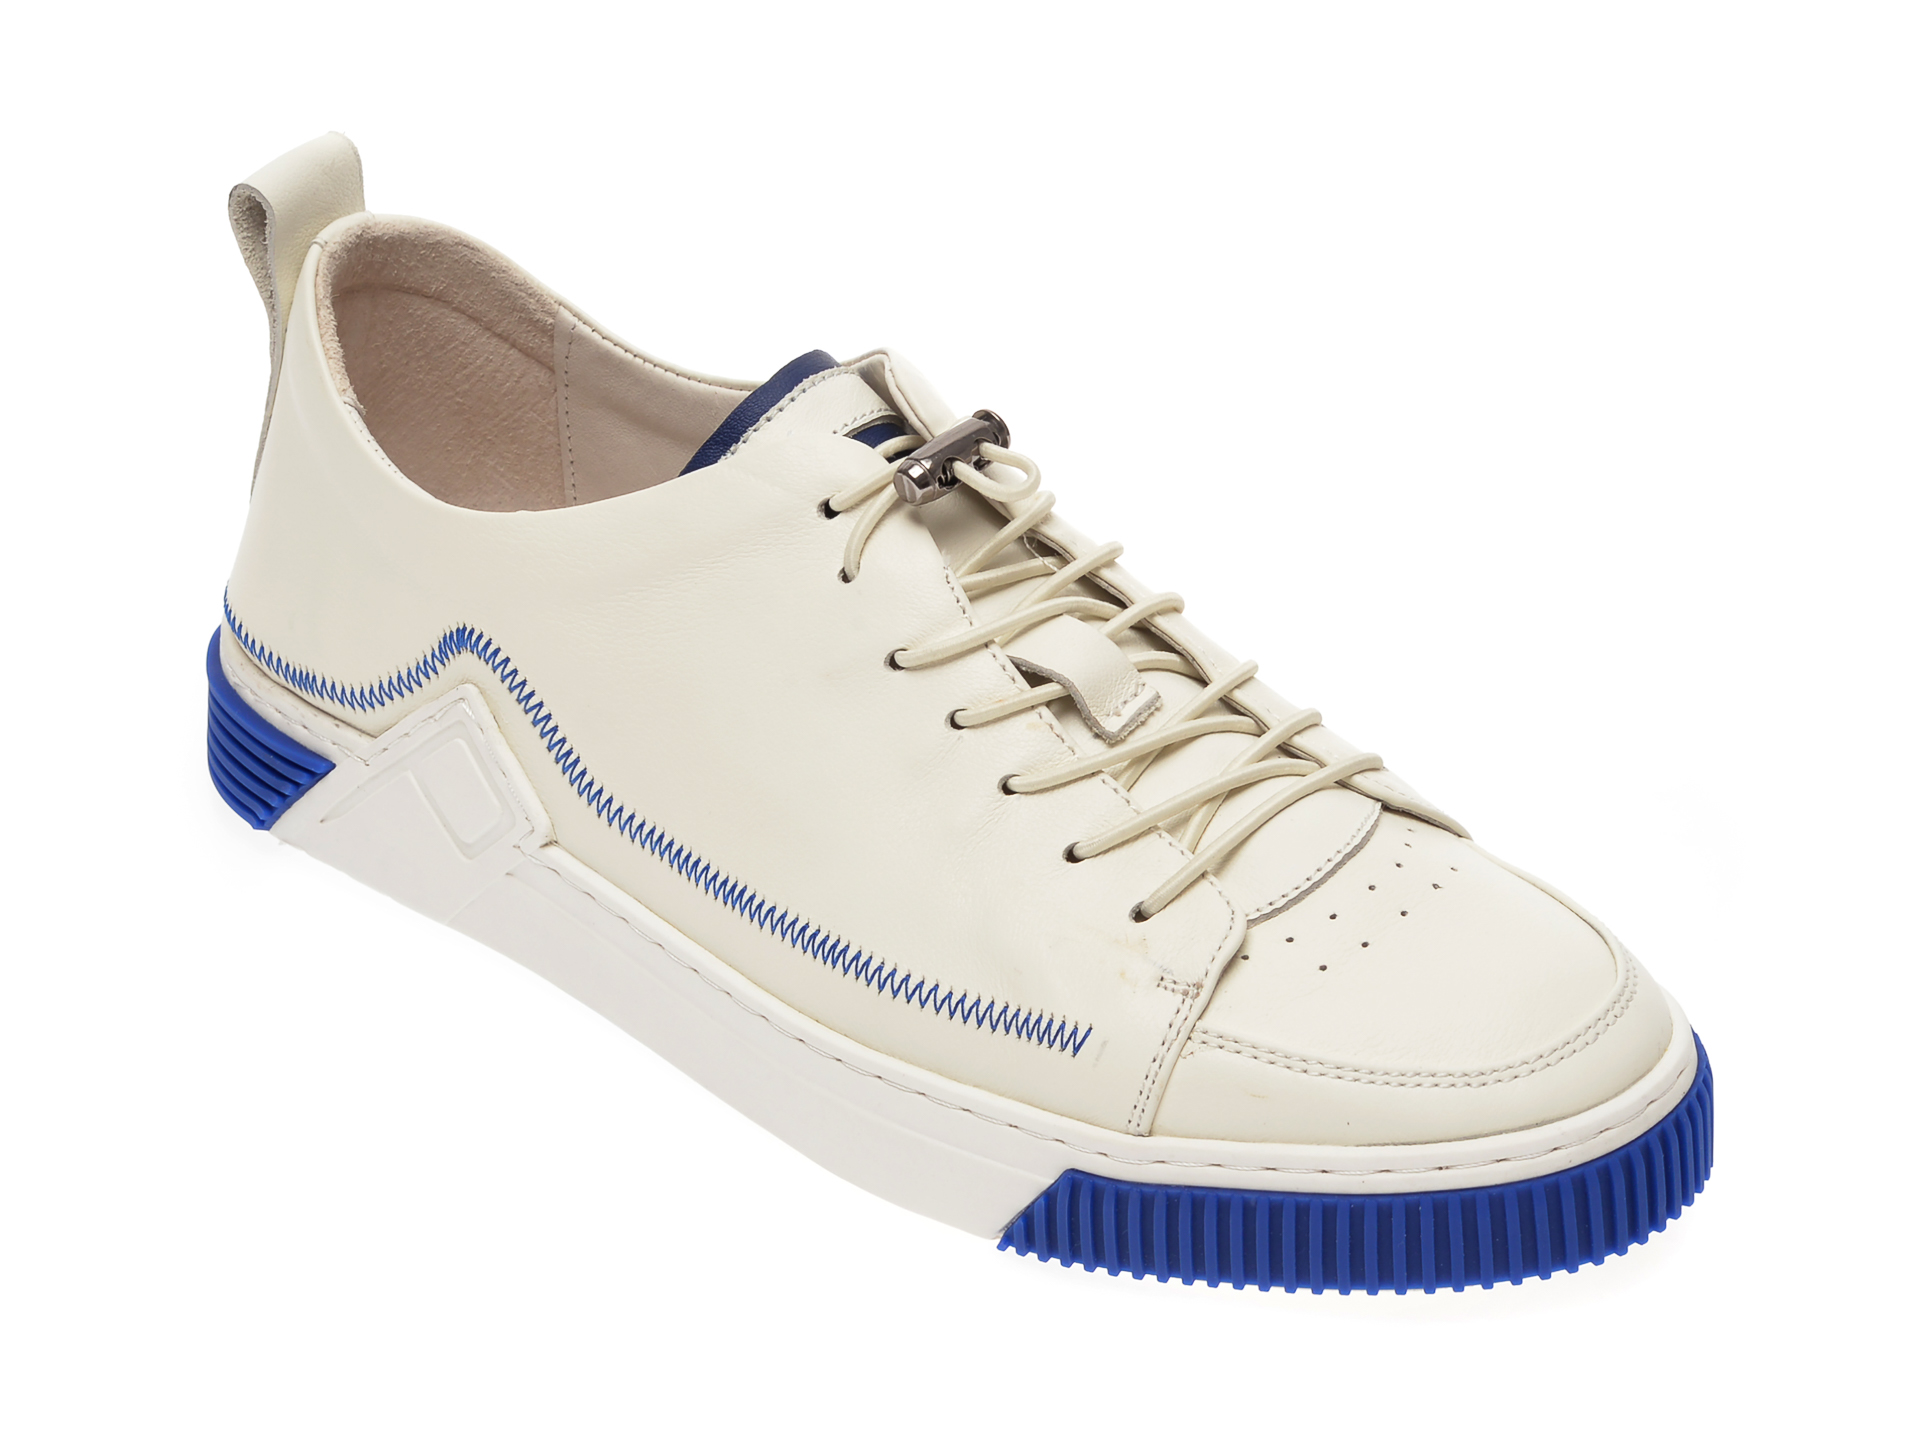 Pantofi OTTER albi, S076151, din piele naturala New